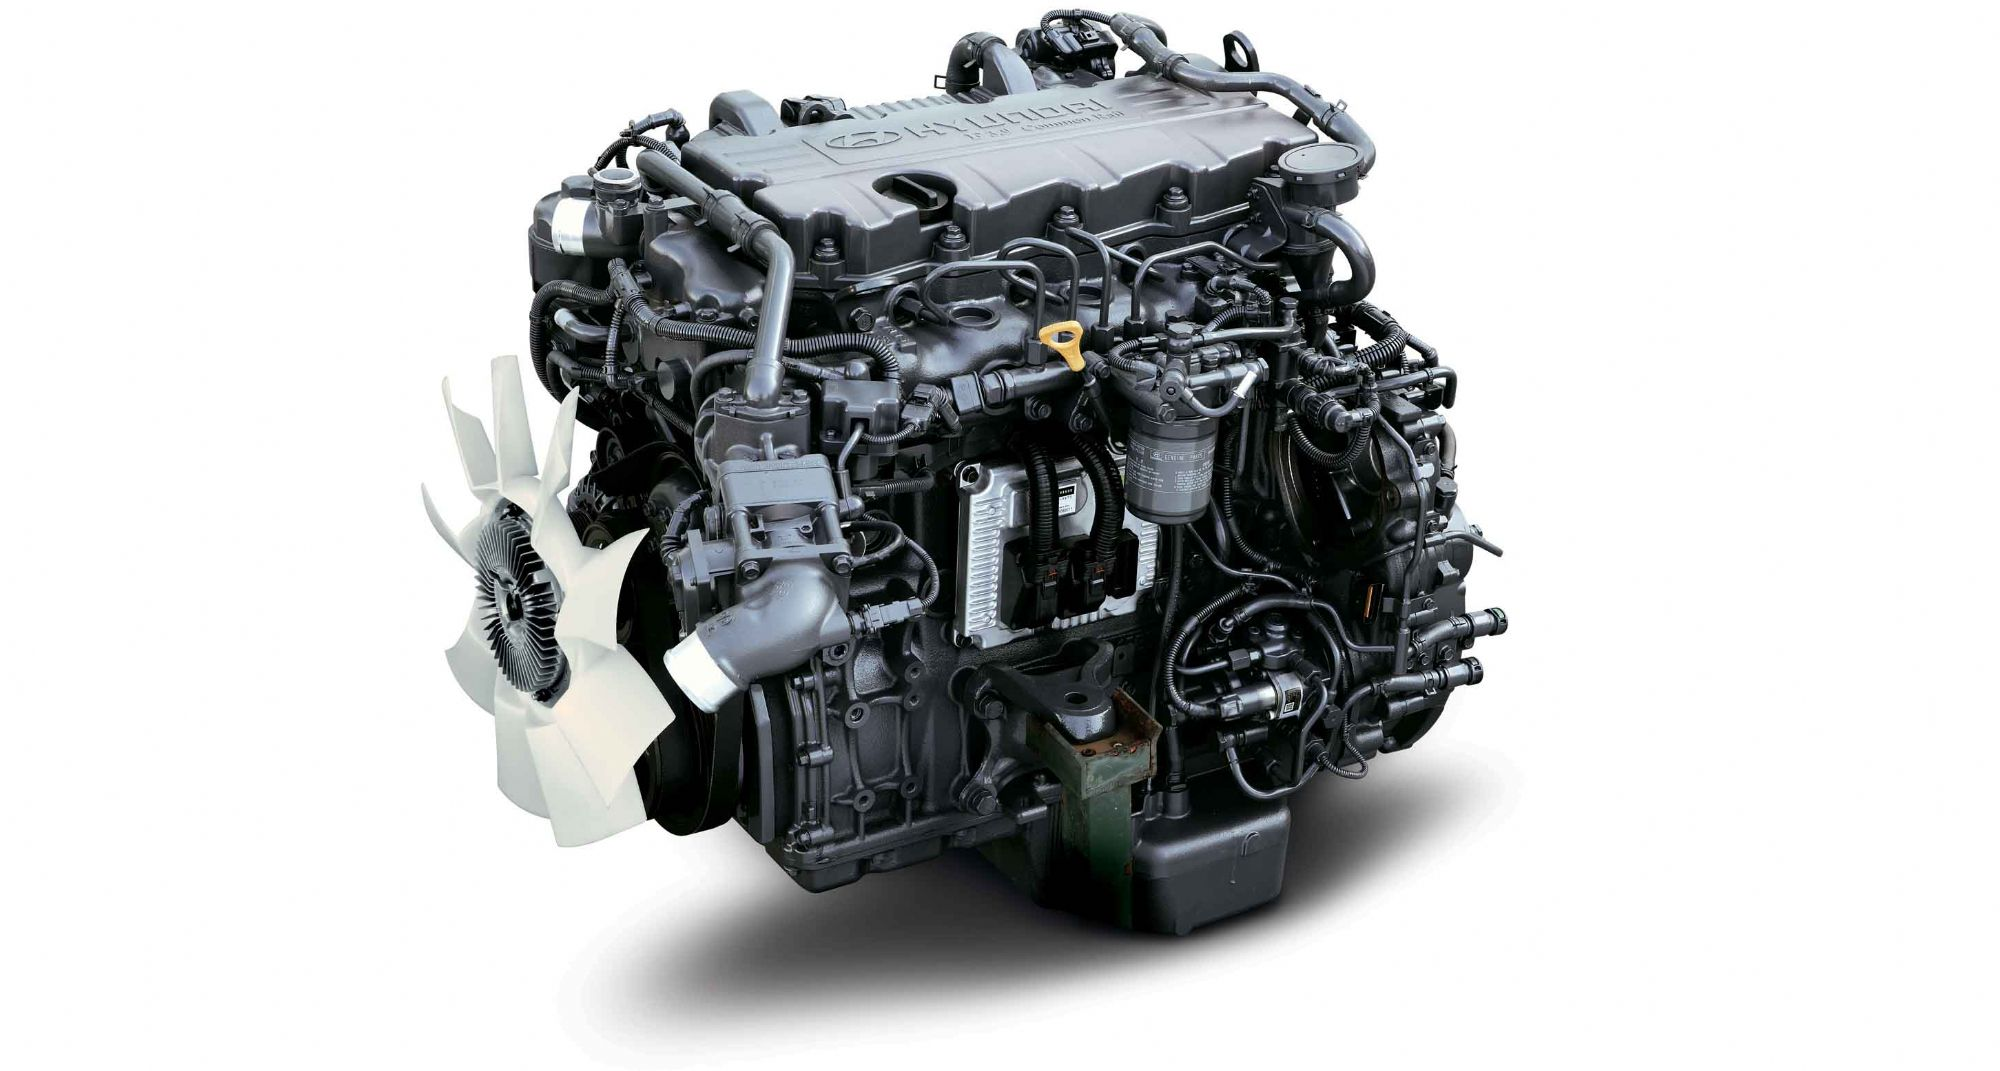 Hyundai Truck Motor Photo HD